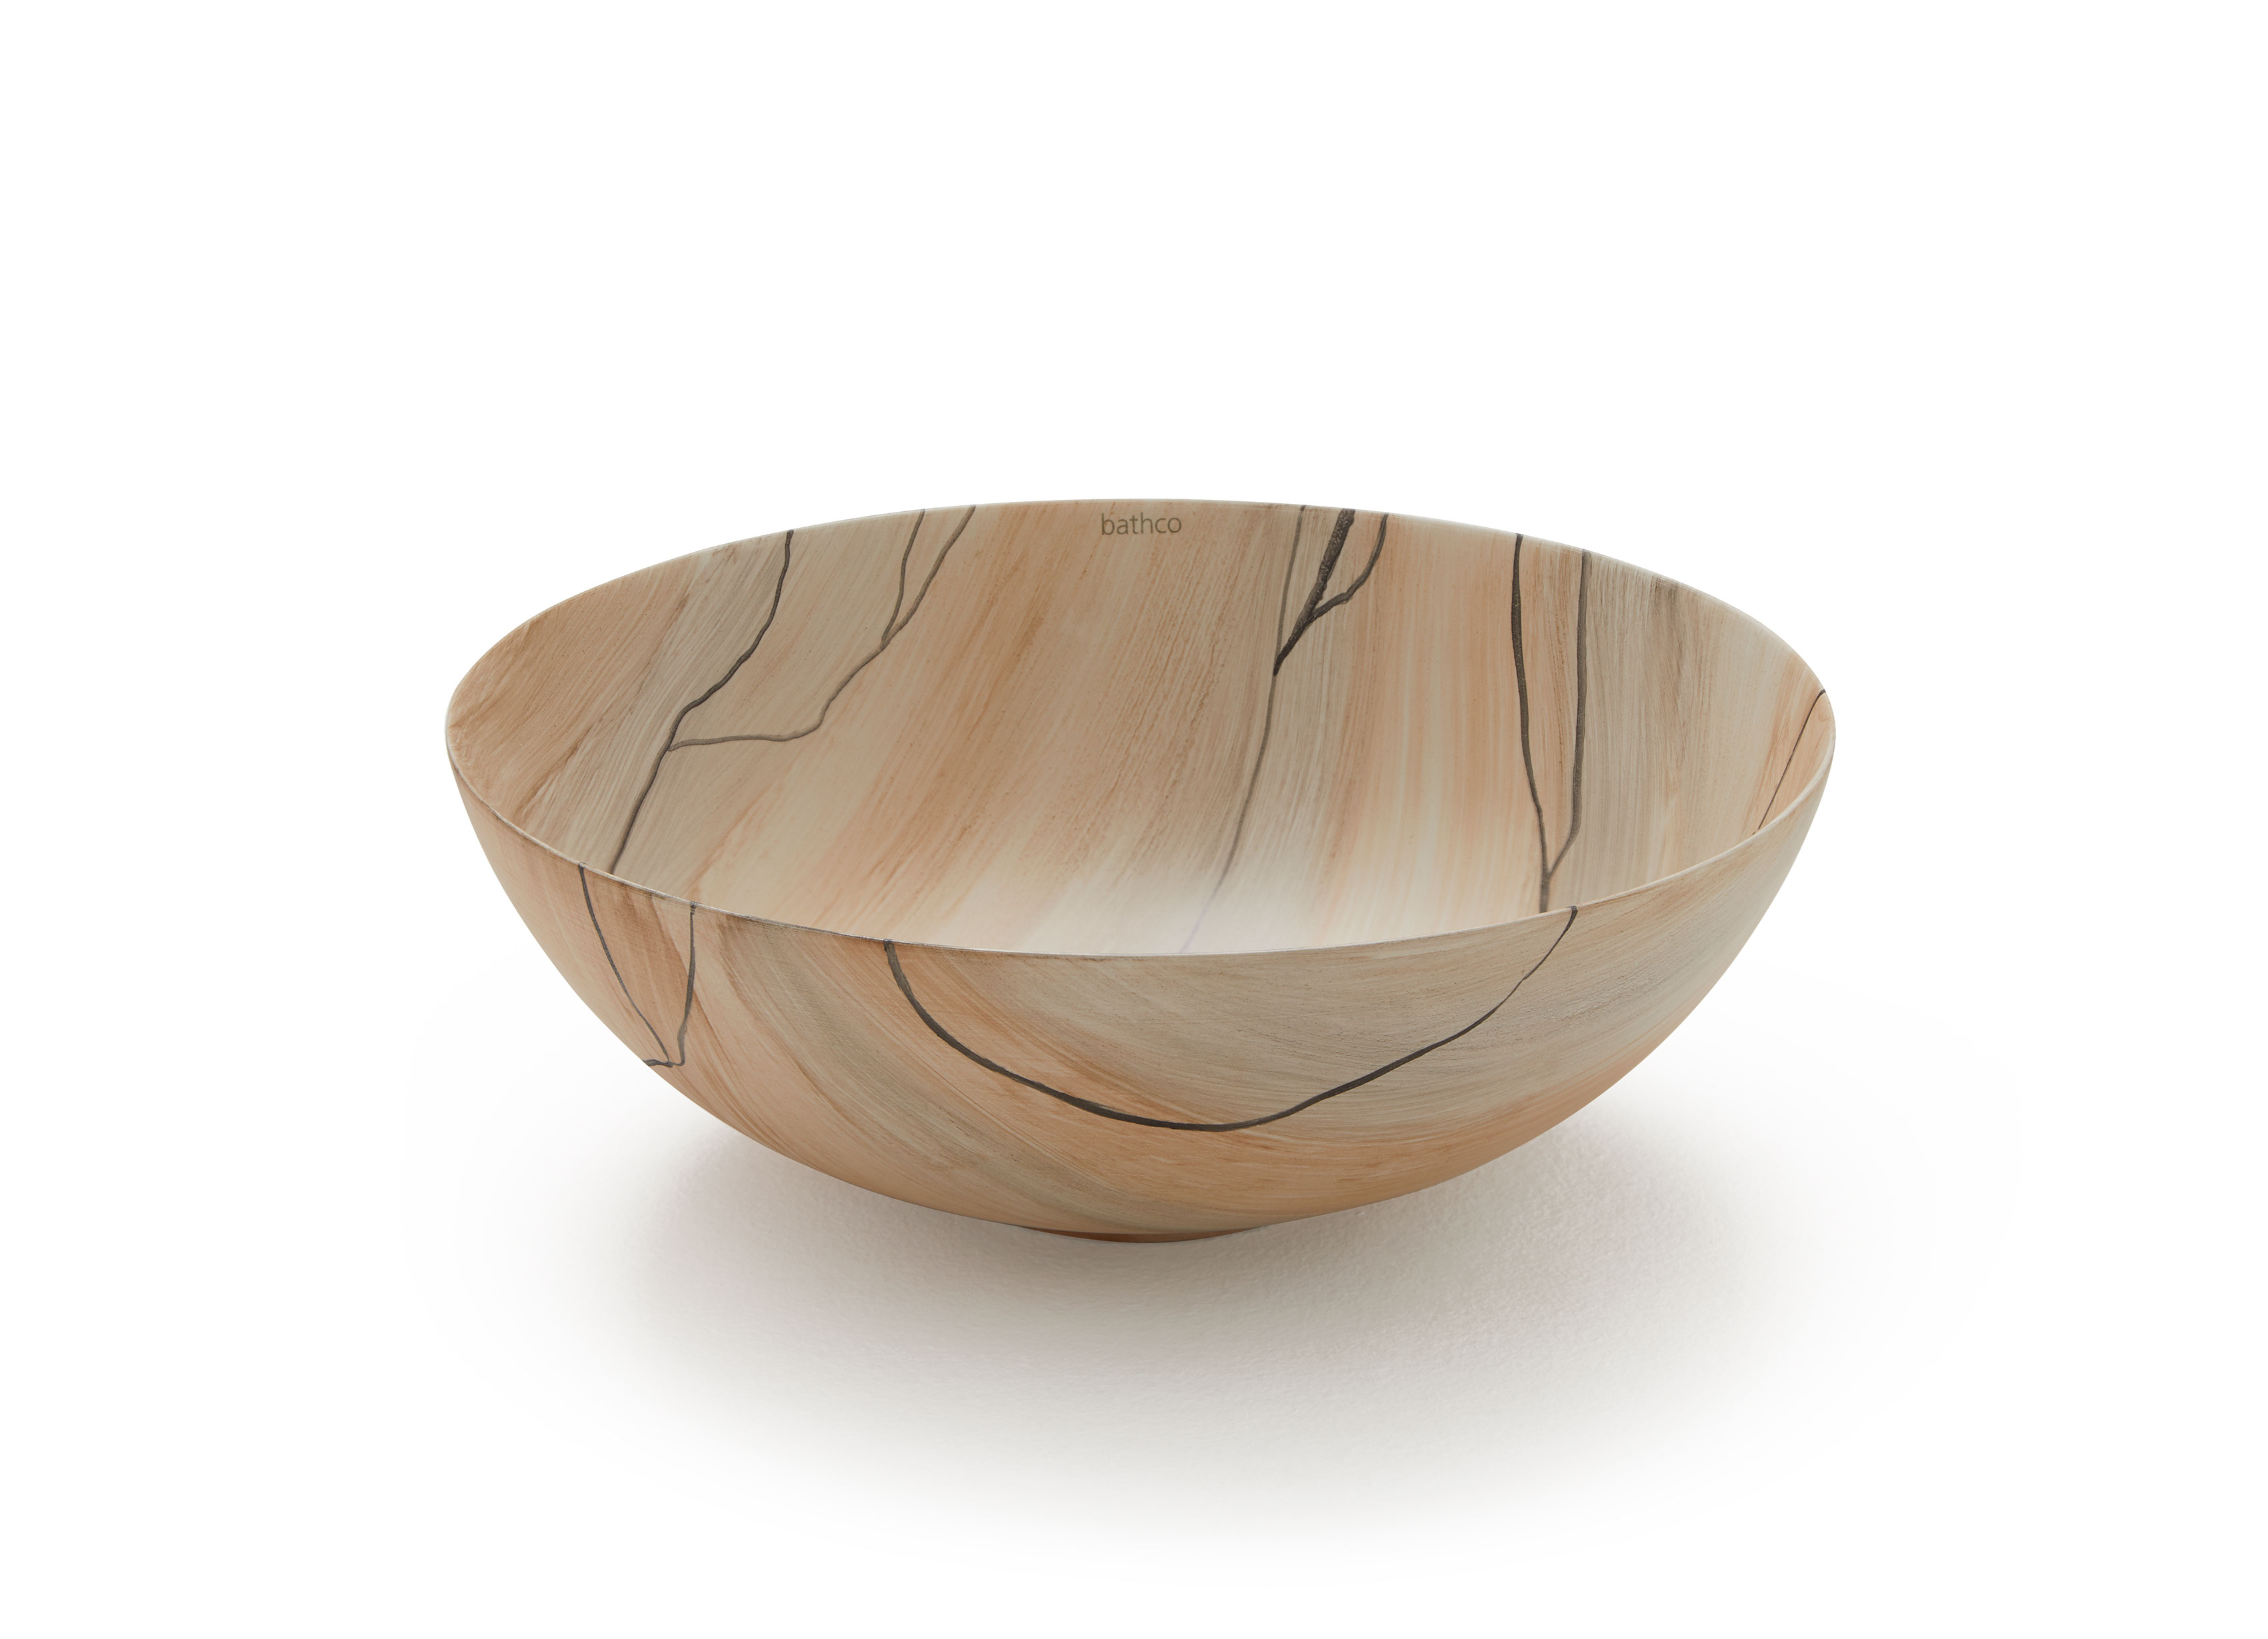 00399 Lavabo Bathco Atelier madera